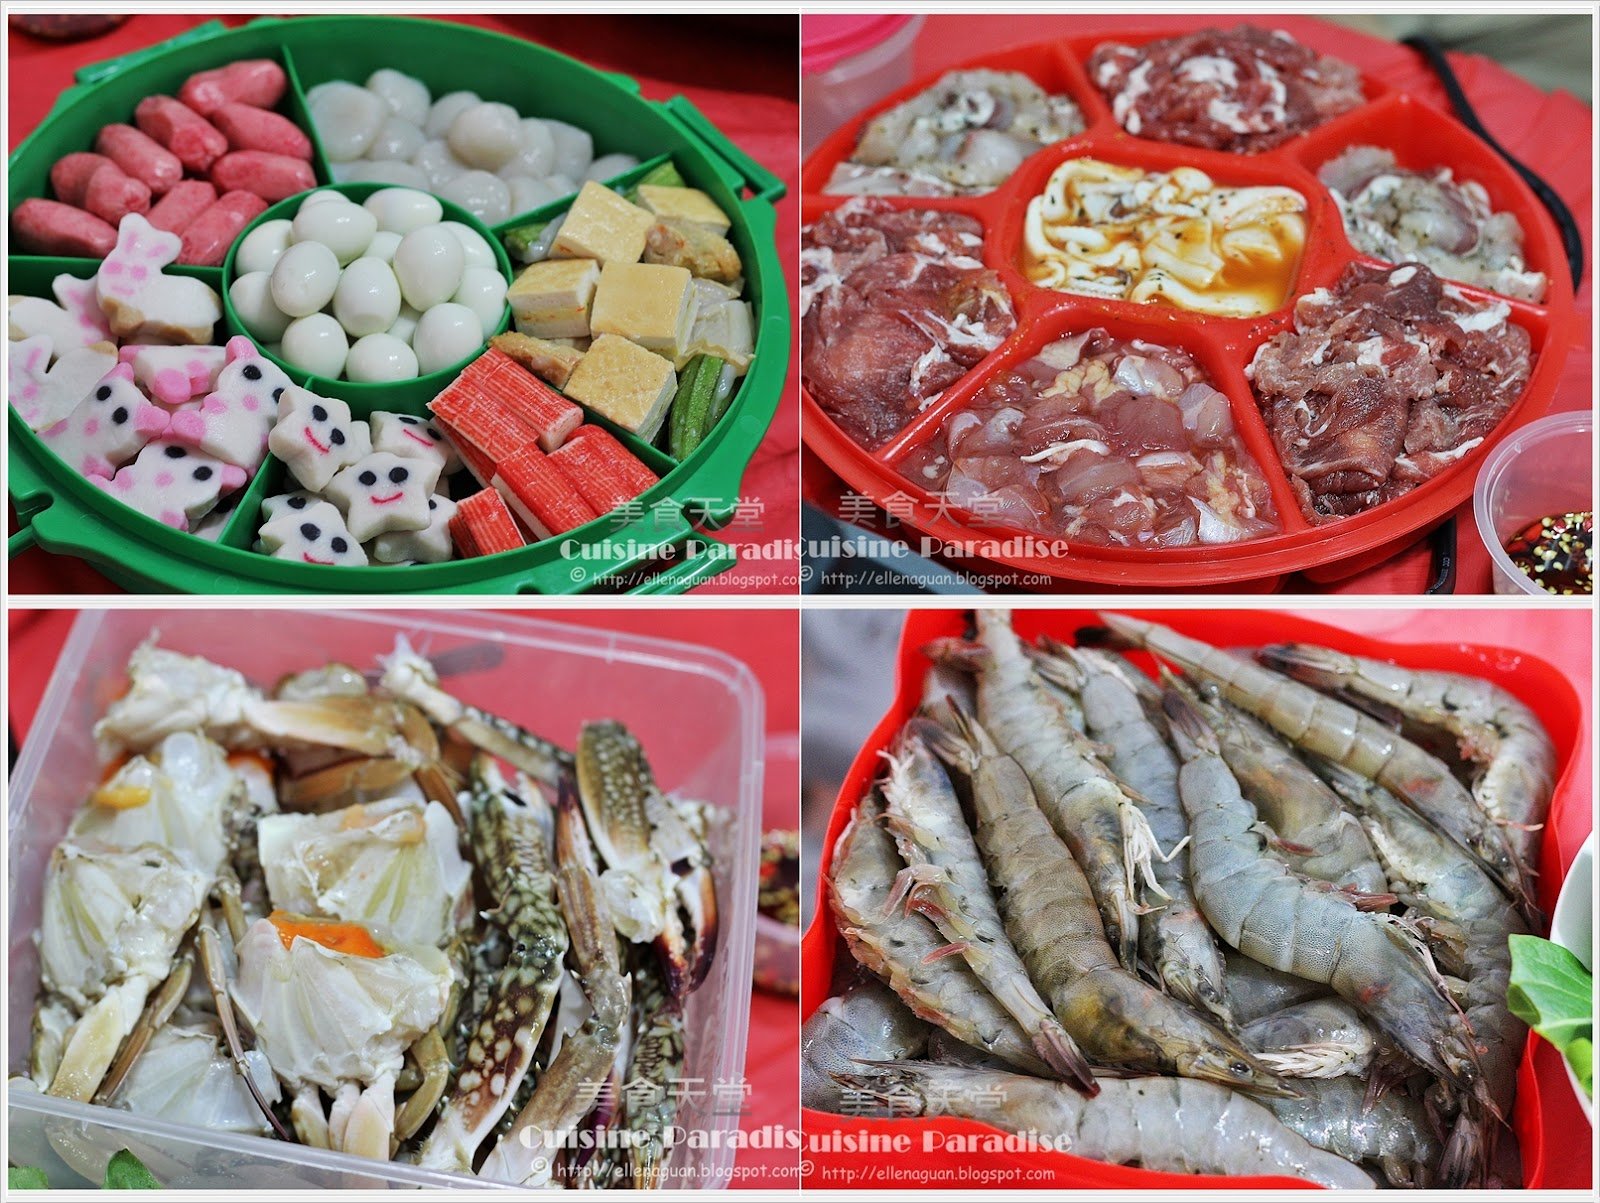 Cuisine paradise singapore food blog recipes reviews and travel